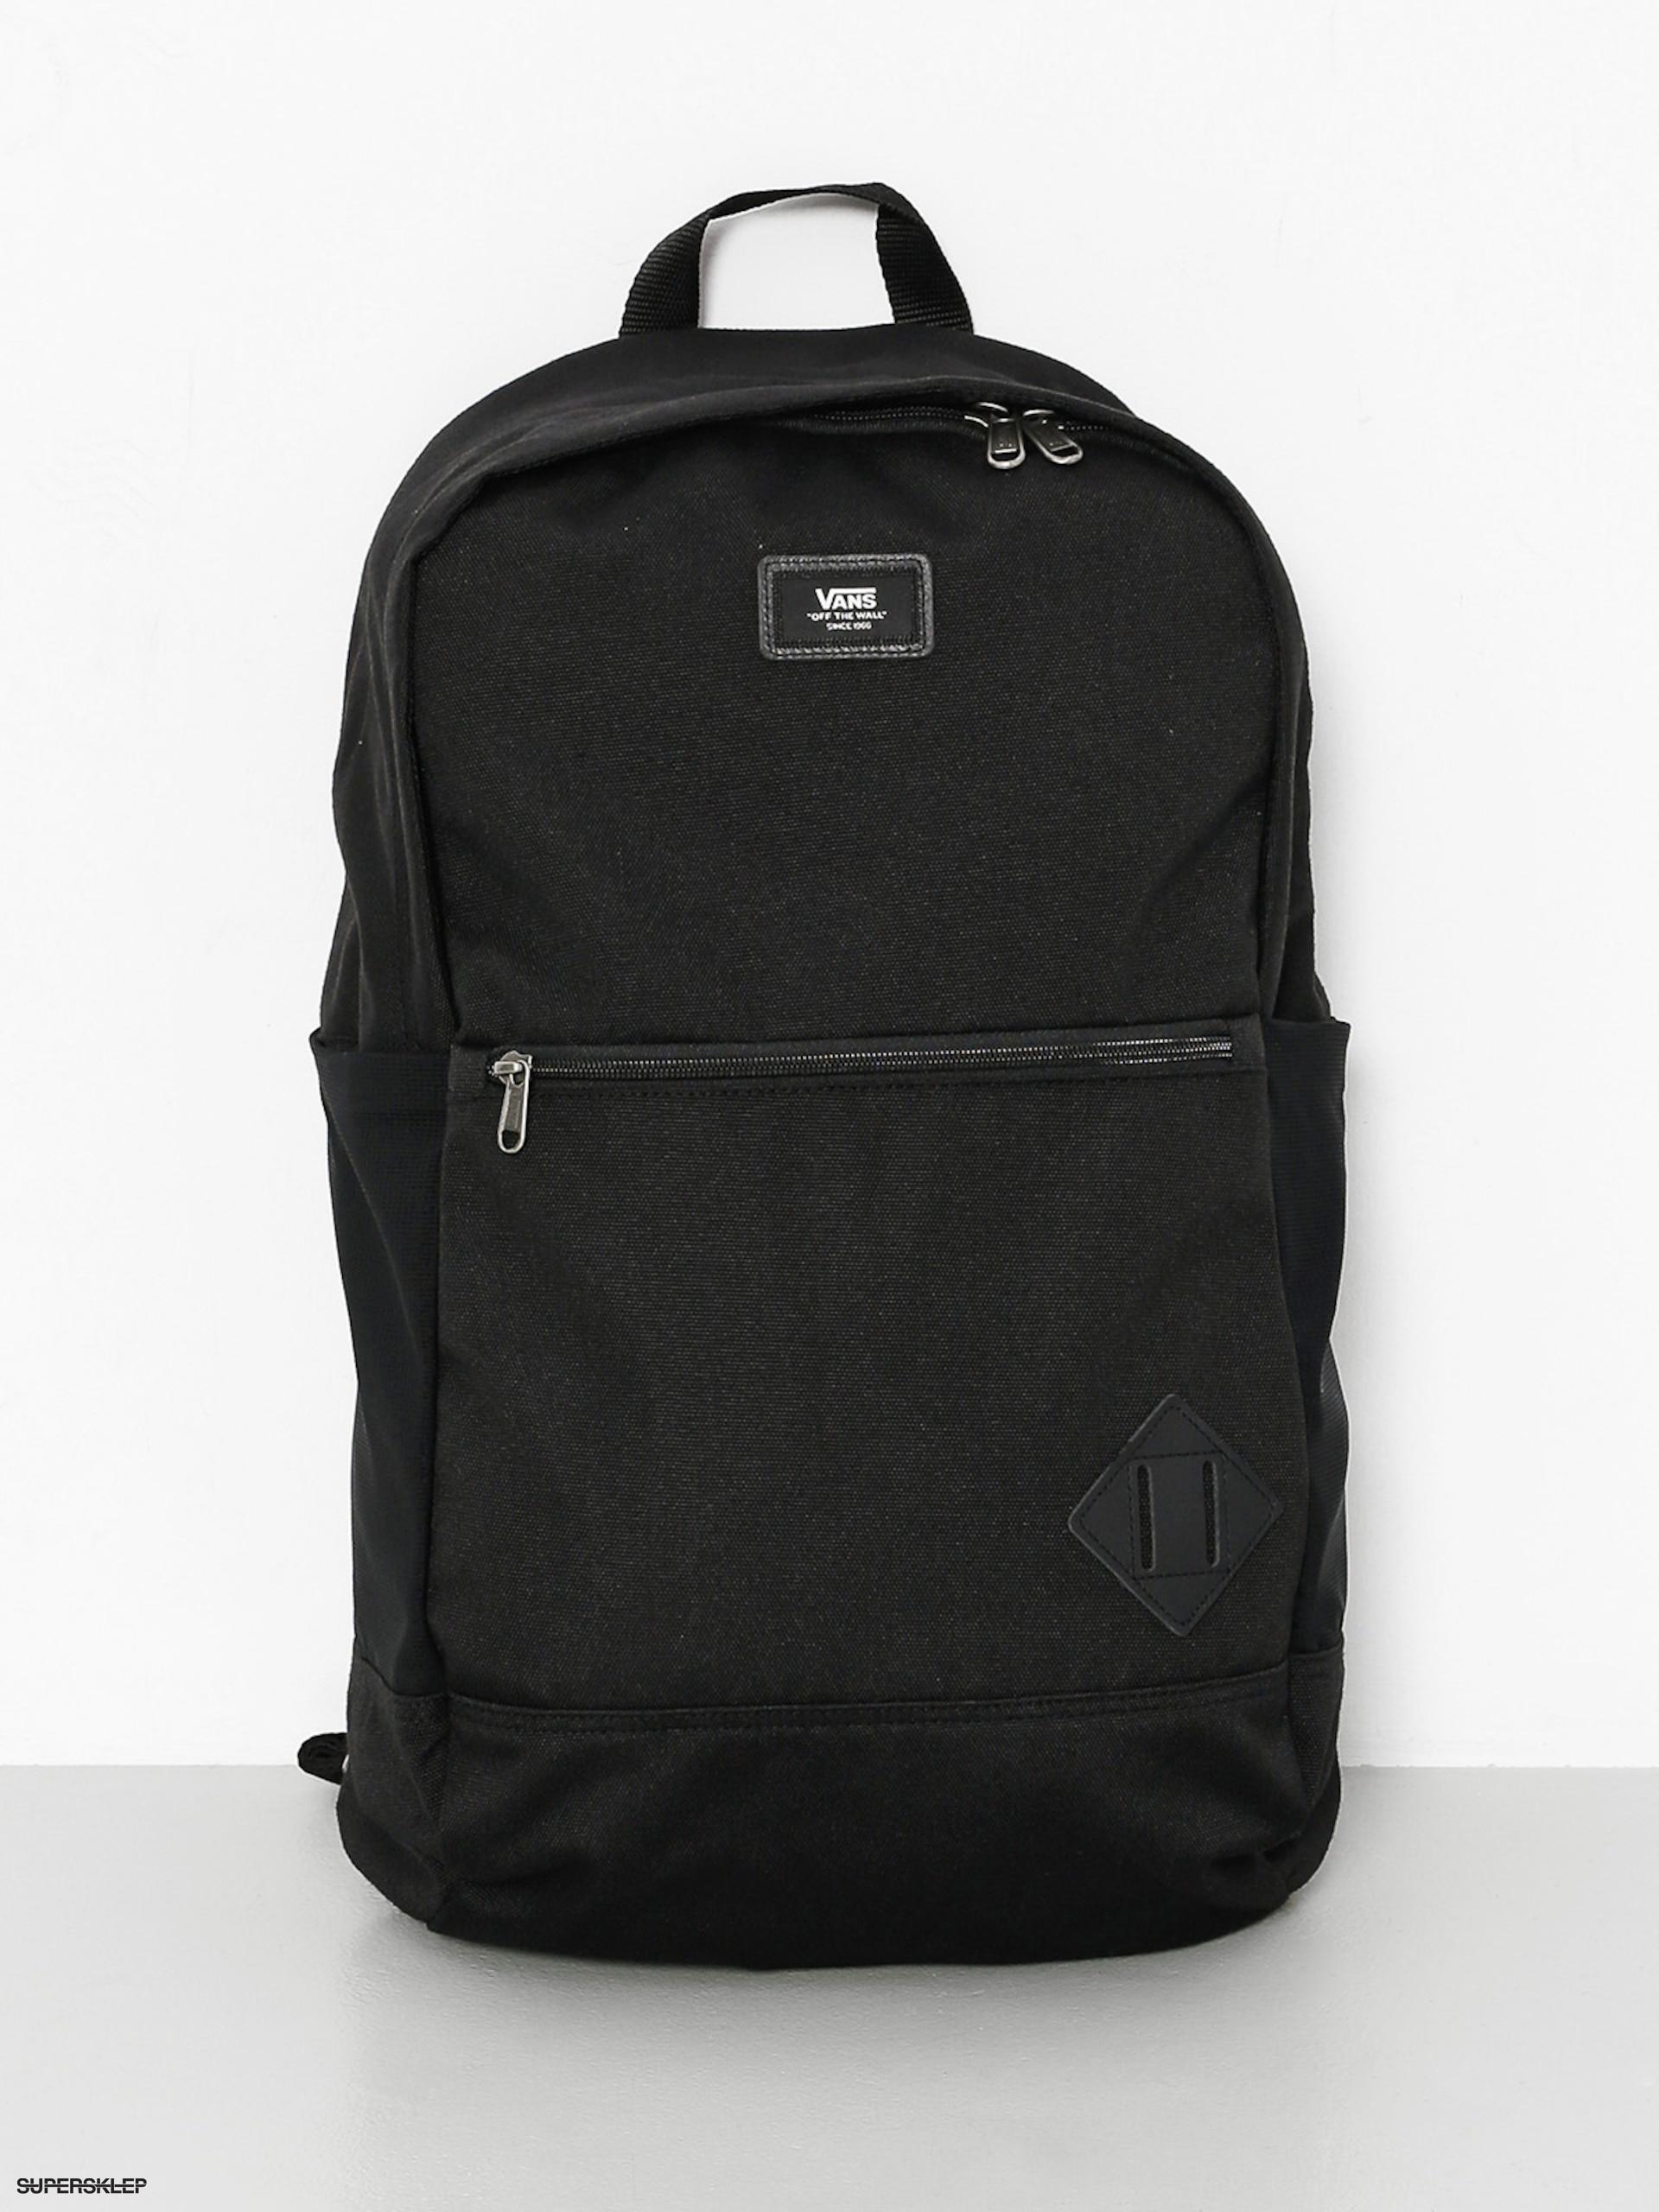 Plecak Vans Van Doren III (black) 00e3f3b60b8